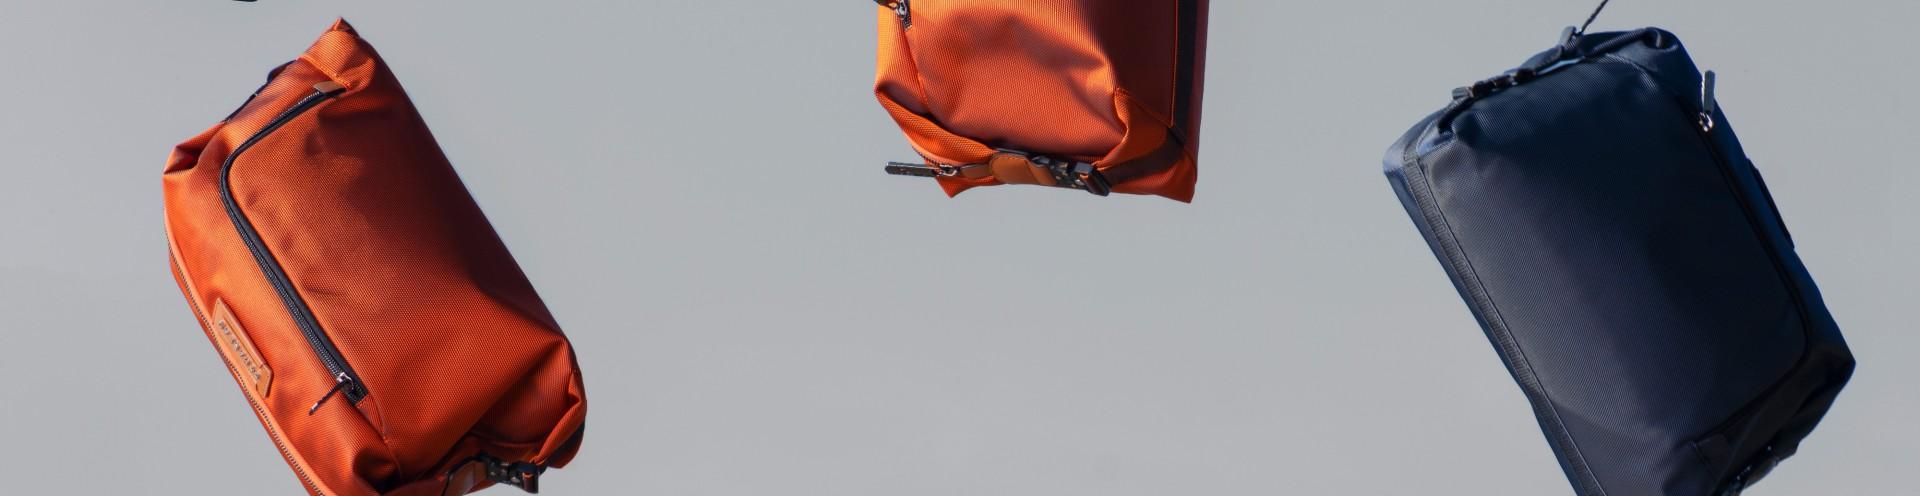 Bolsas de Aseo para Viajes